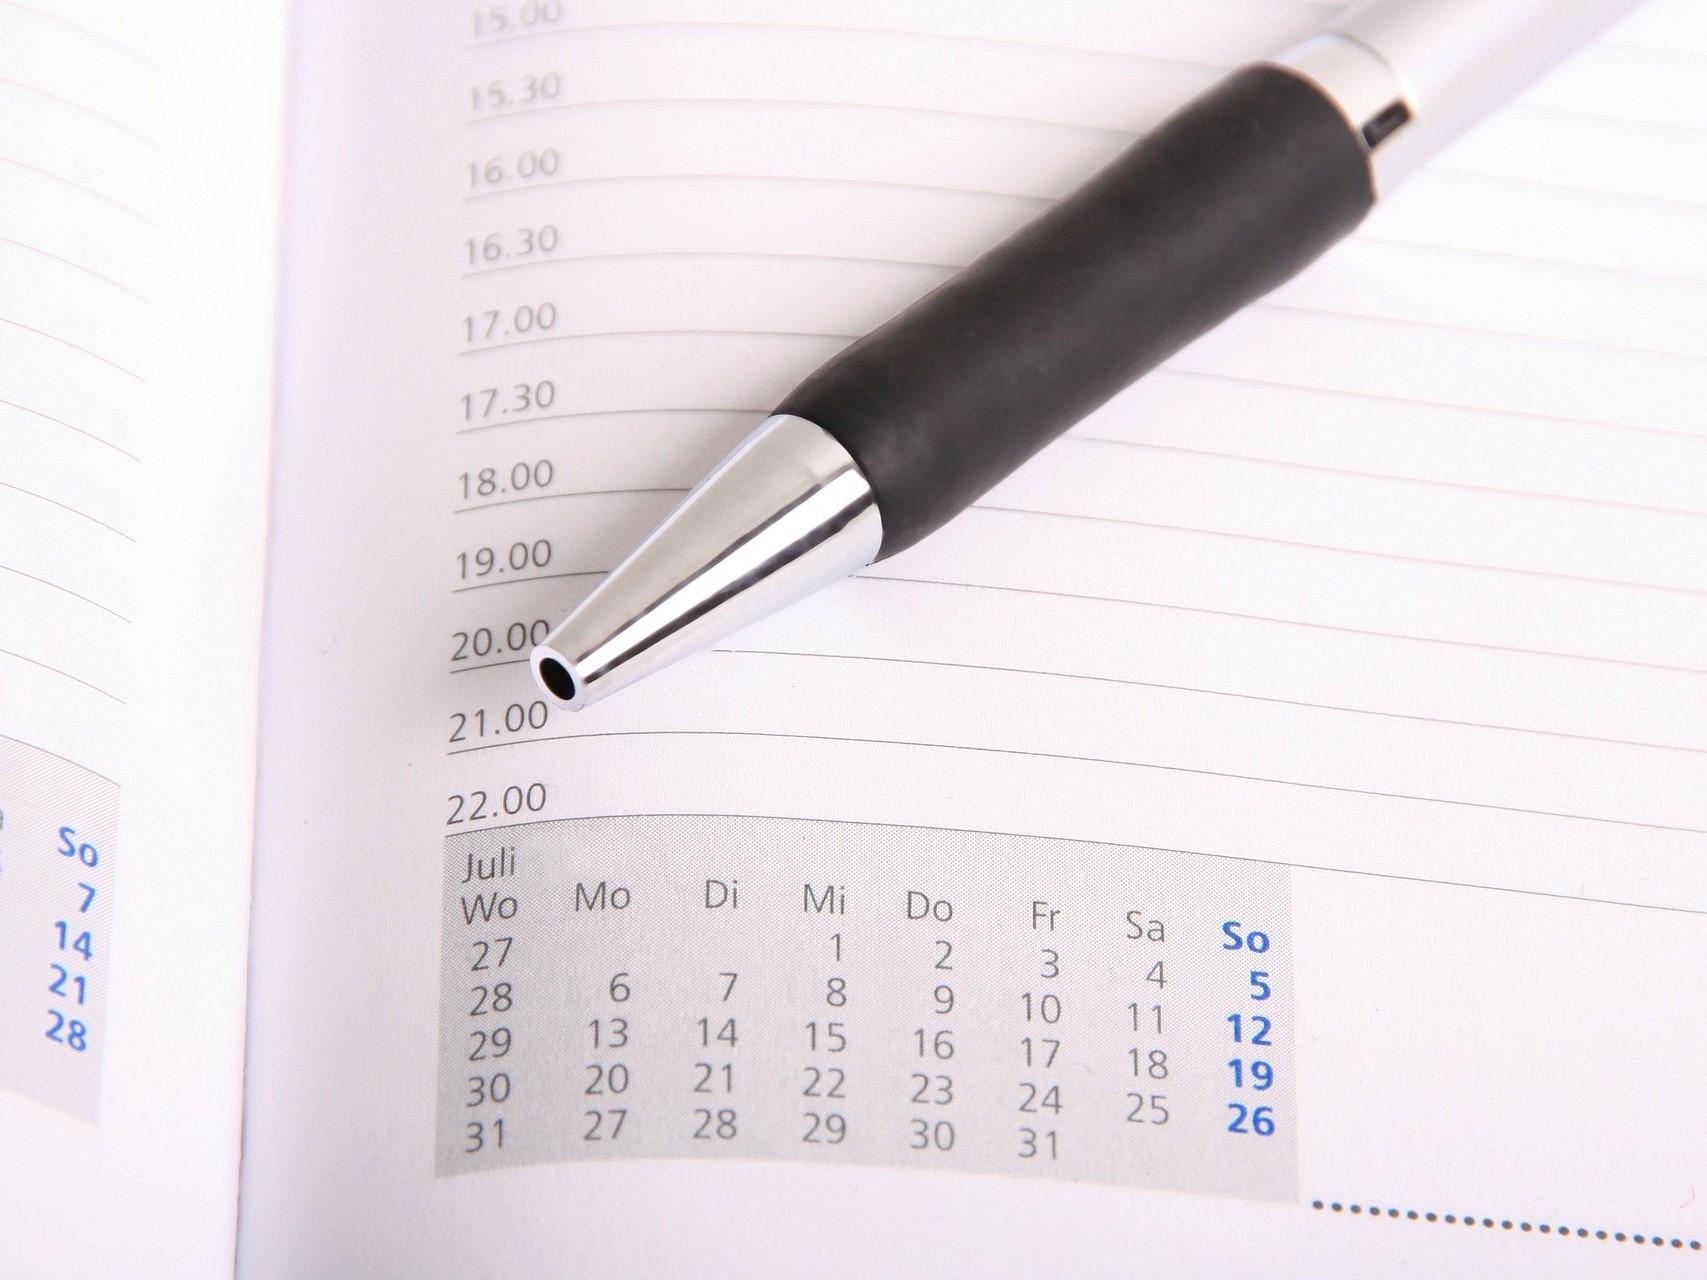 Abbildung Kalender mit Kugelschreiber